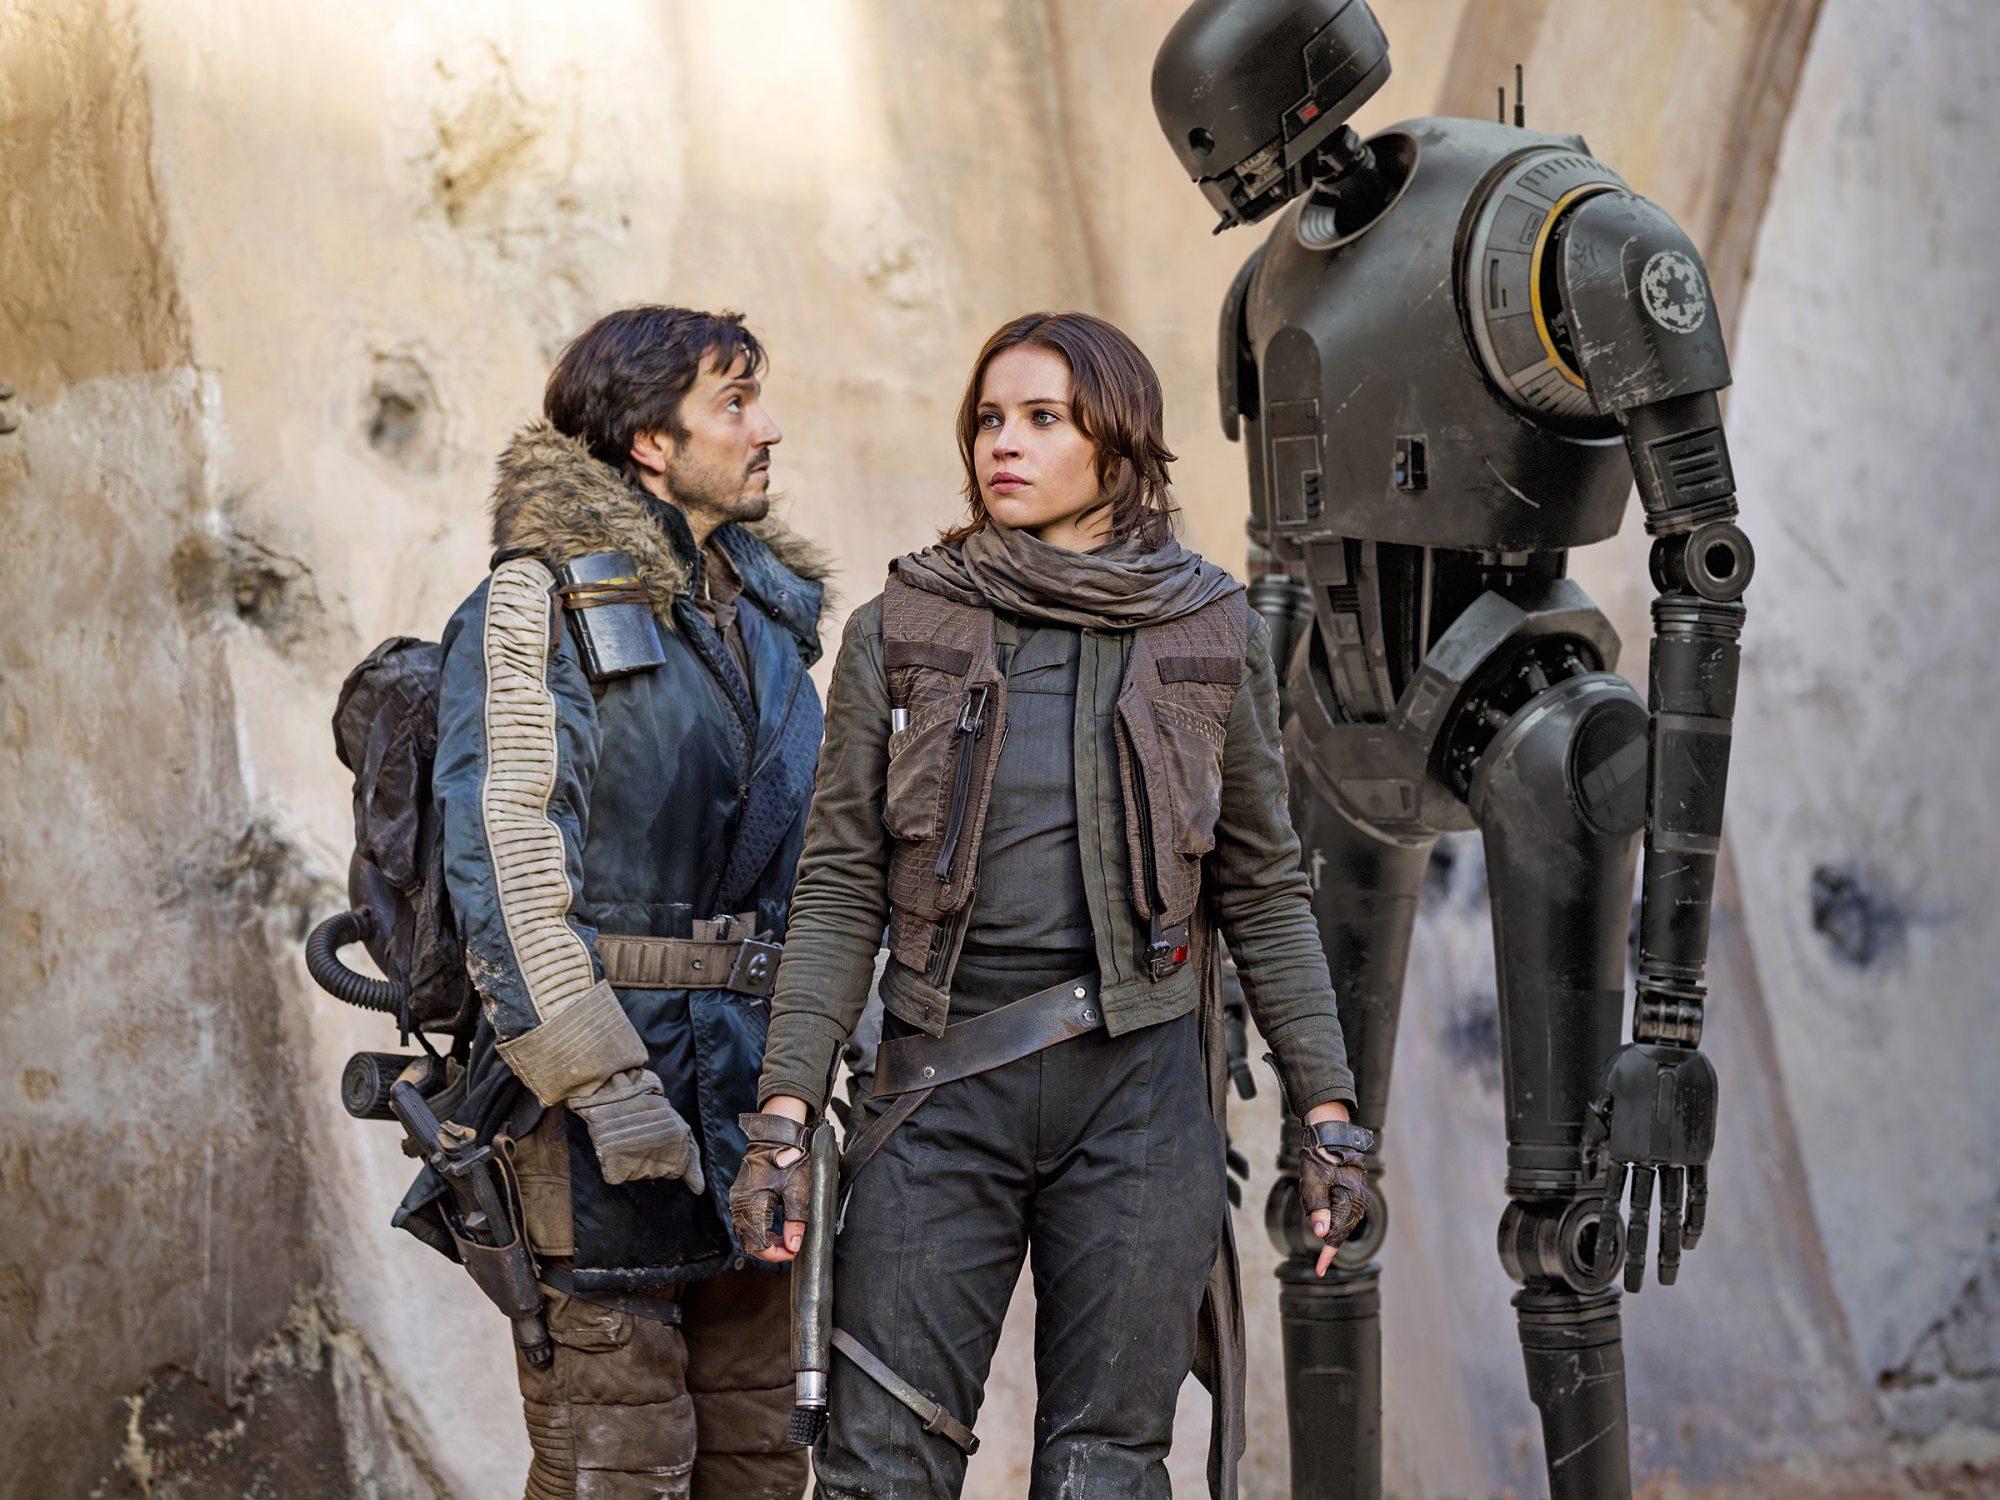 Cassian Andor (Diego Luna), Jyn Erso (Felicity Jones) och K-2SO. Foto: Disney Studios Motion Pictures.